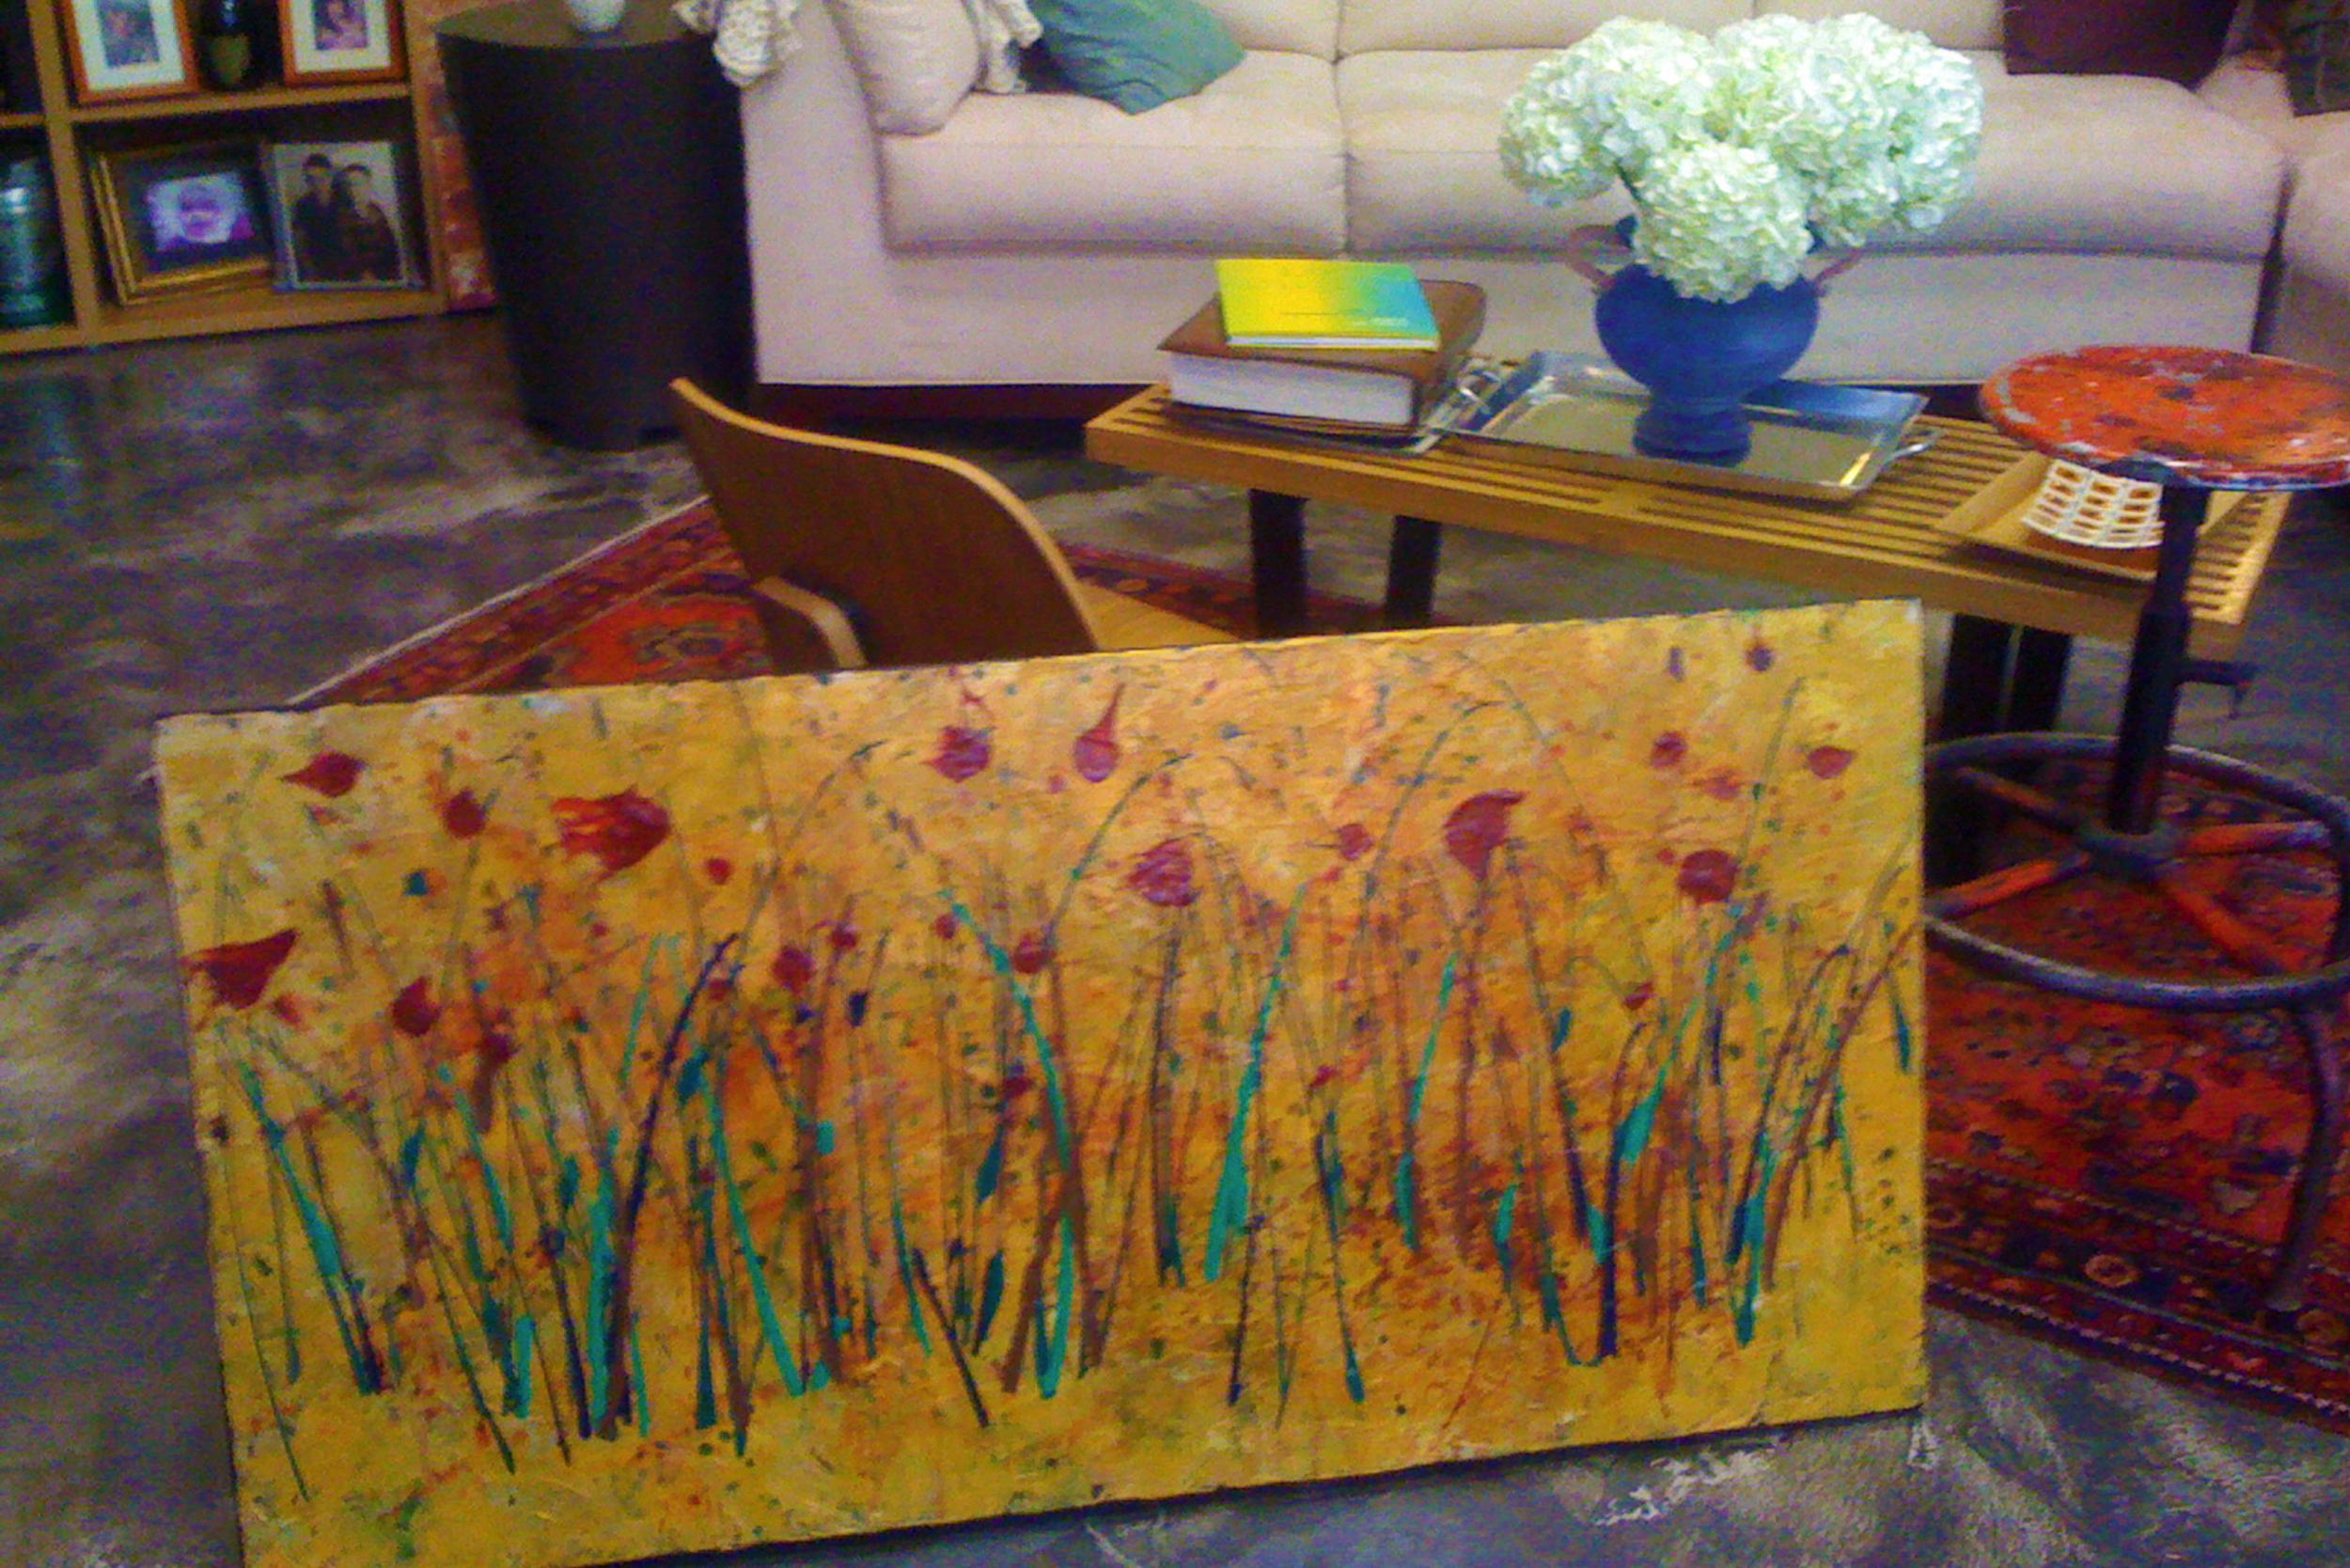 golden-floral-landscape-painting-artist-taylor-smith-studio.jpg